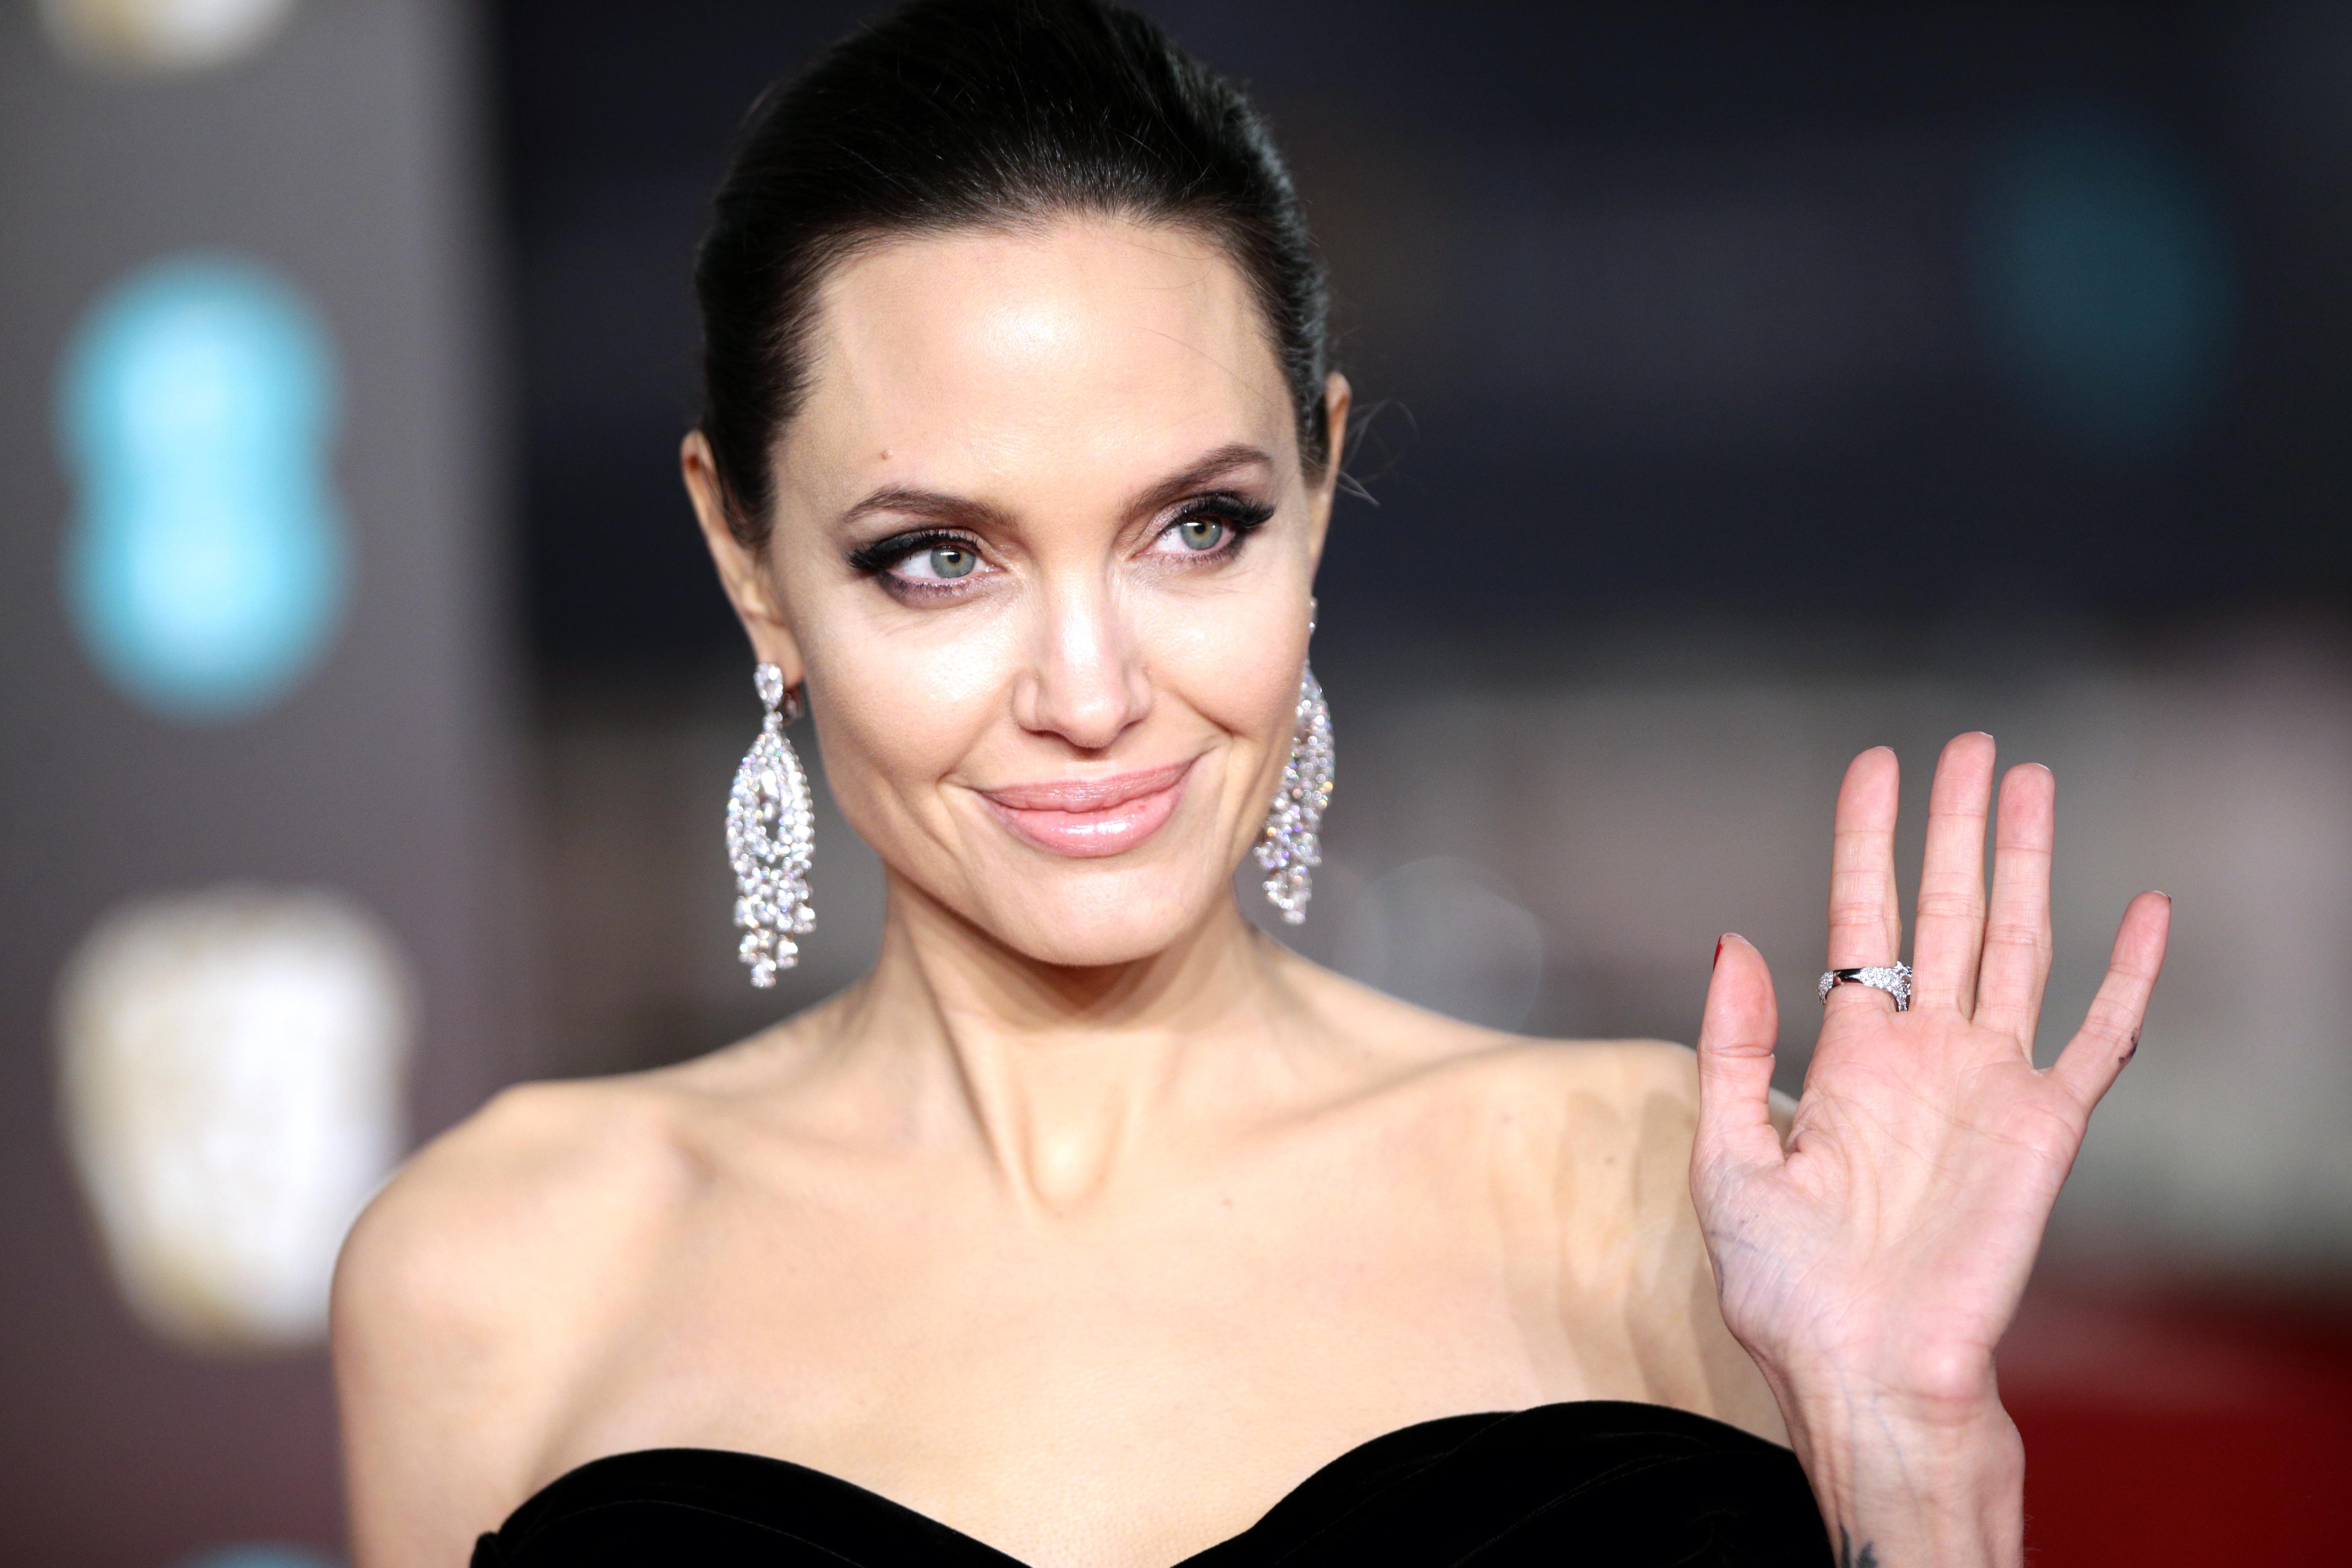 Angelina Jolie 2018, HD Celebrities, 4k Wallpapers, Images ... анджелина джоли 2018